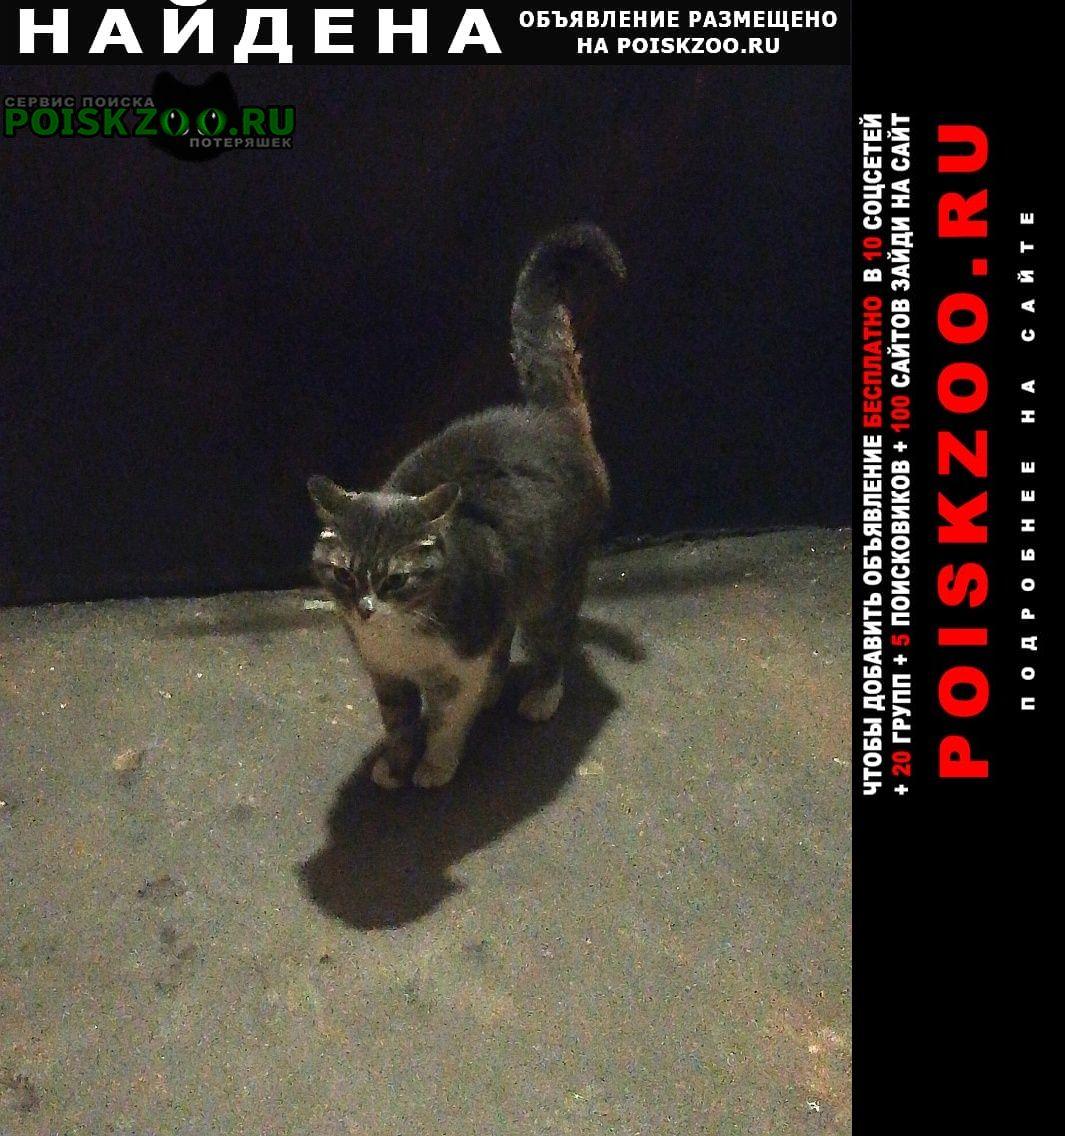 Найдена кошка или котик домашний Москва